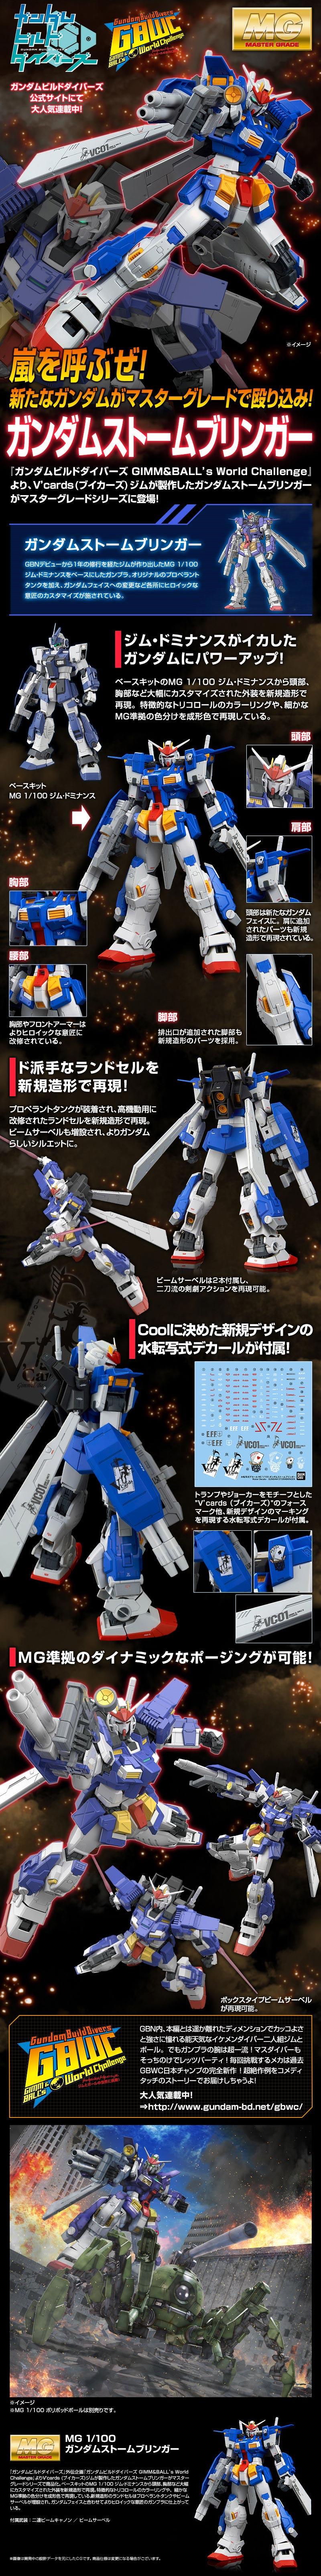 MG Gundam Stormbringer Details